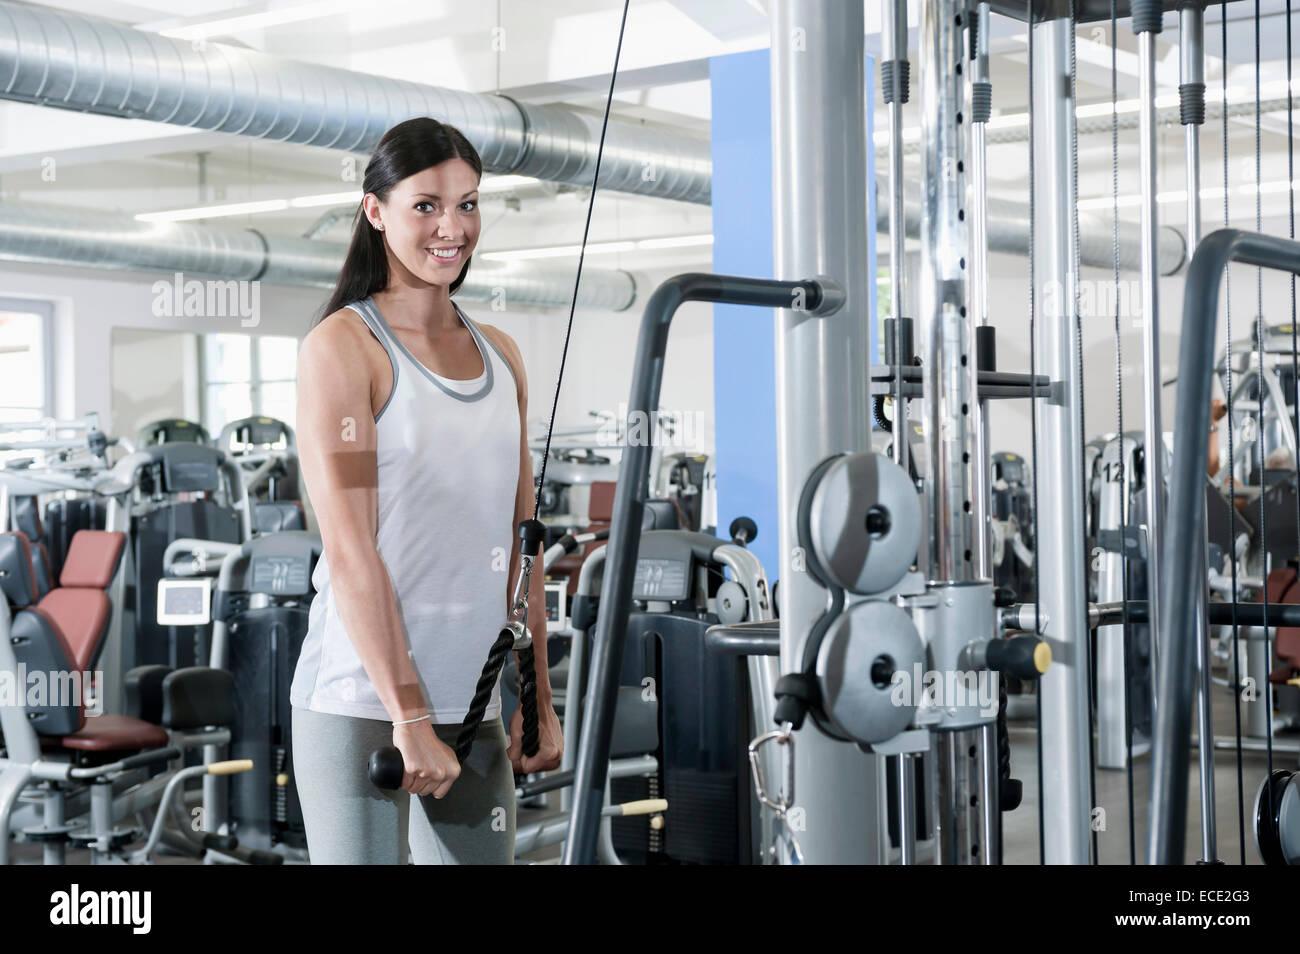 Attraktive junge Frau Porträt-Fitness-studio Stockbild